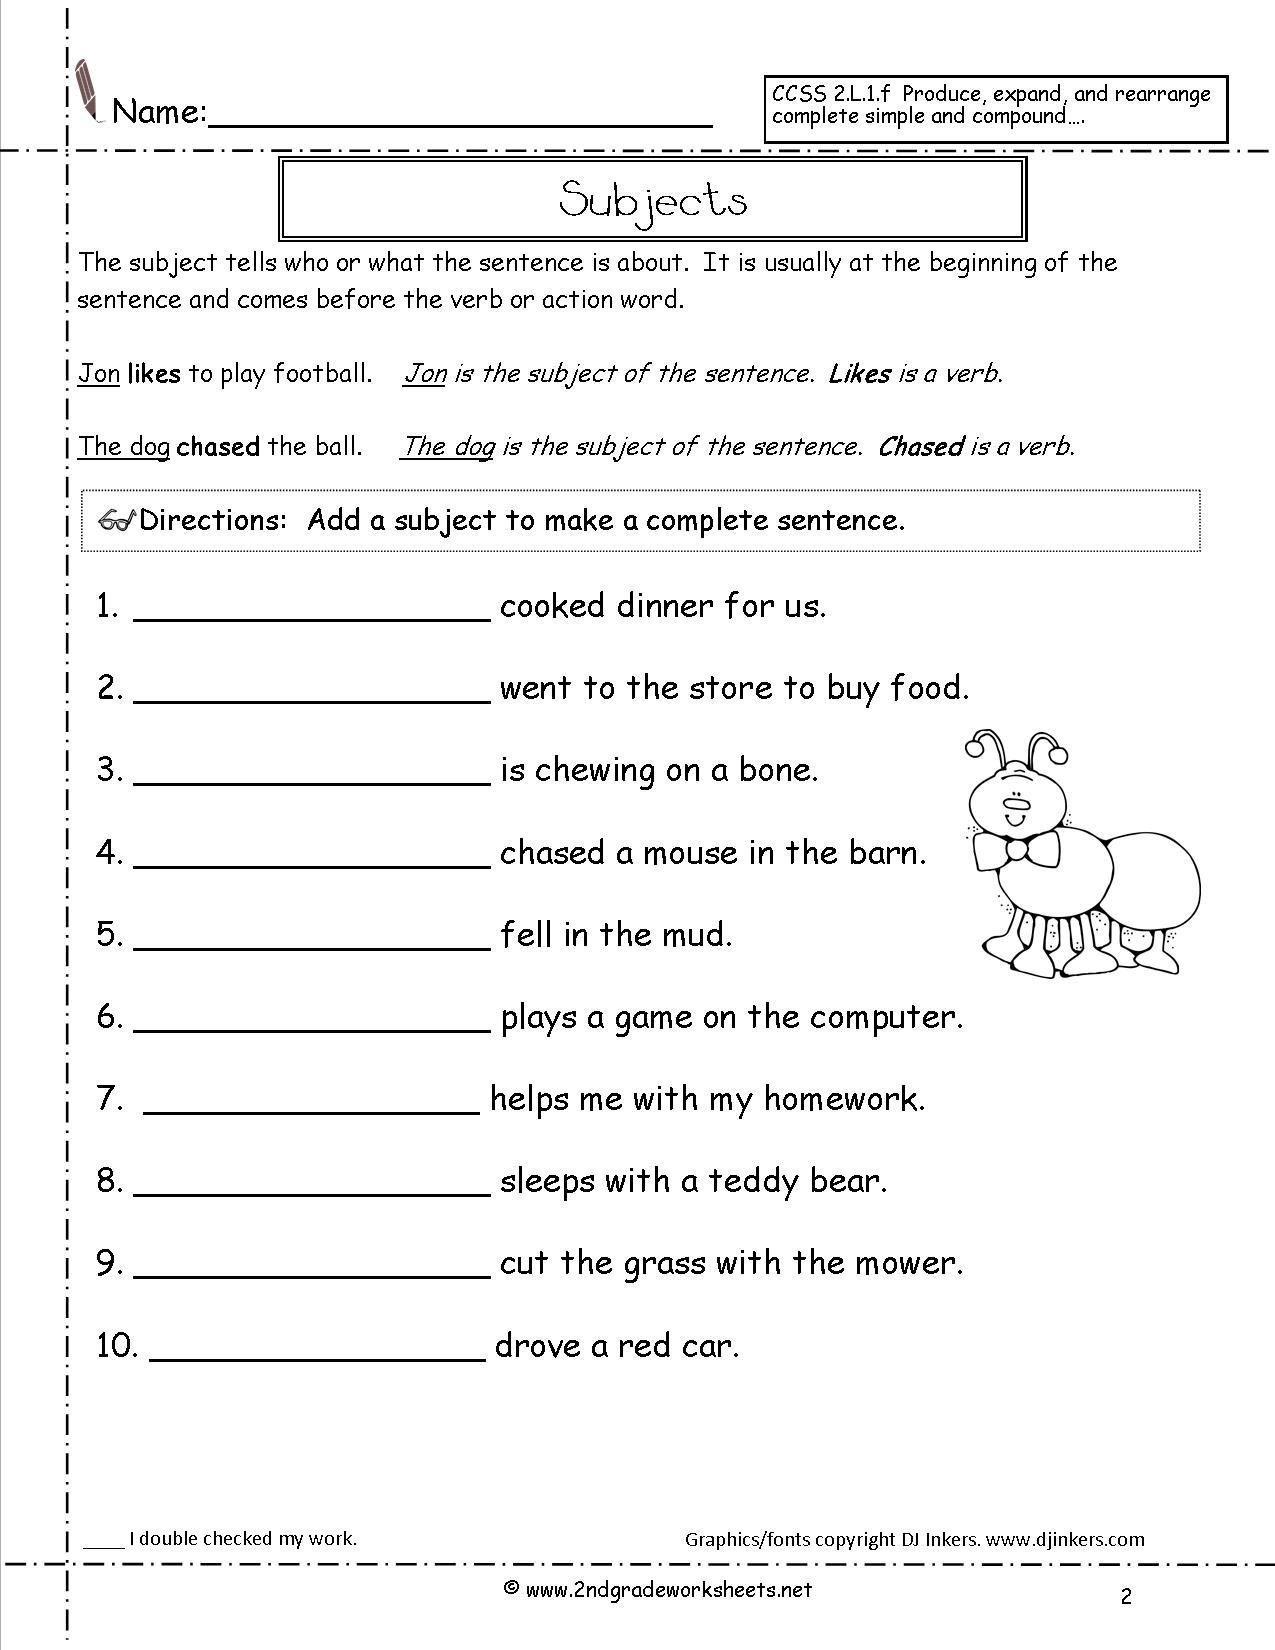 worksheet Second Grade Grammar Worksheets pin by ritu saini on bhanu pinterest worksheets english grammar second grade subjects worksheet